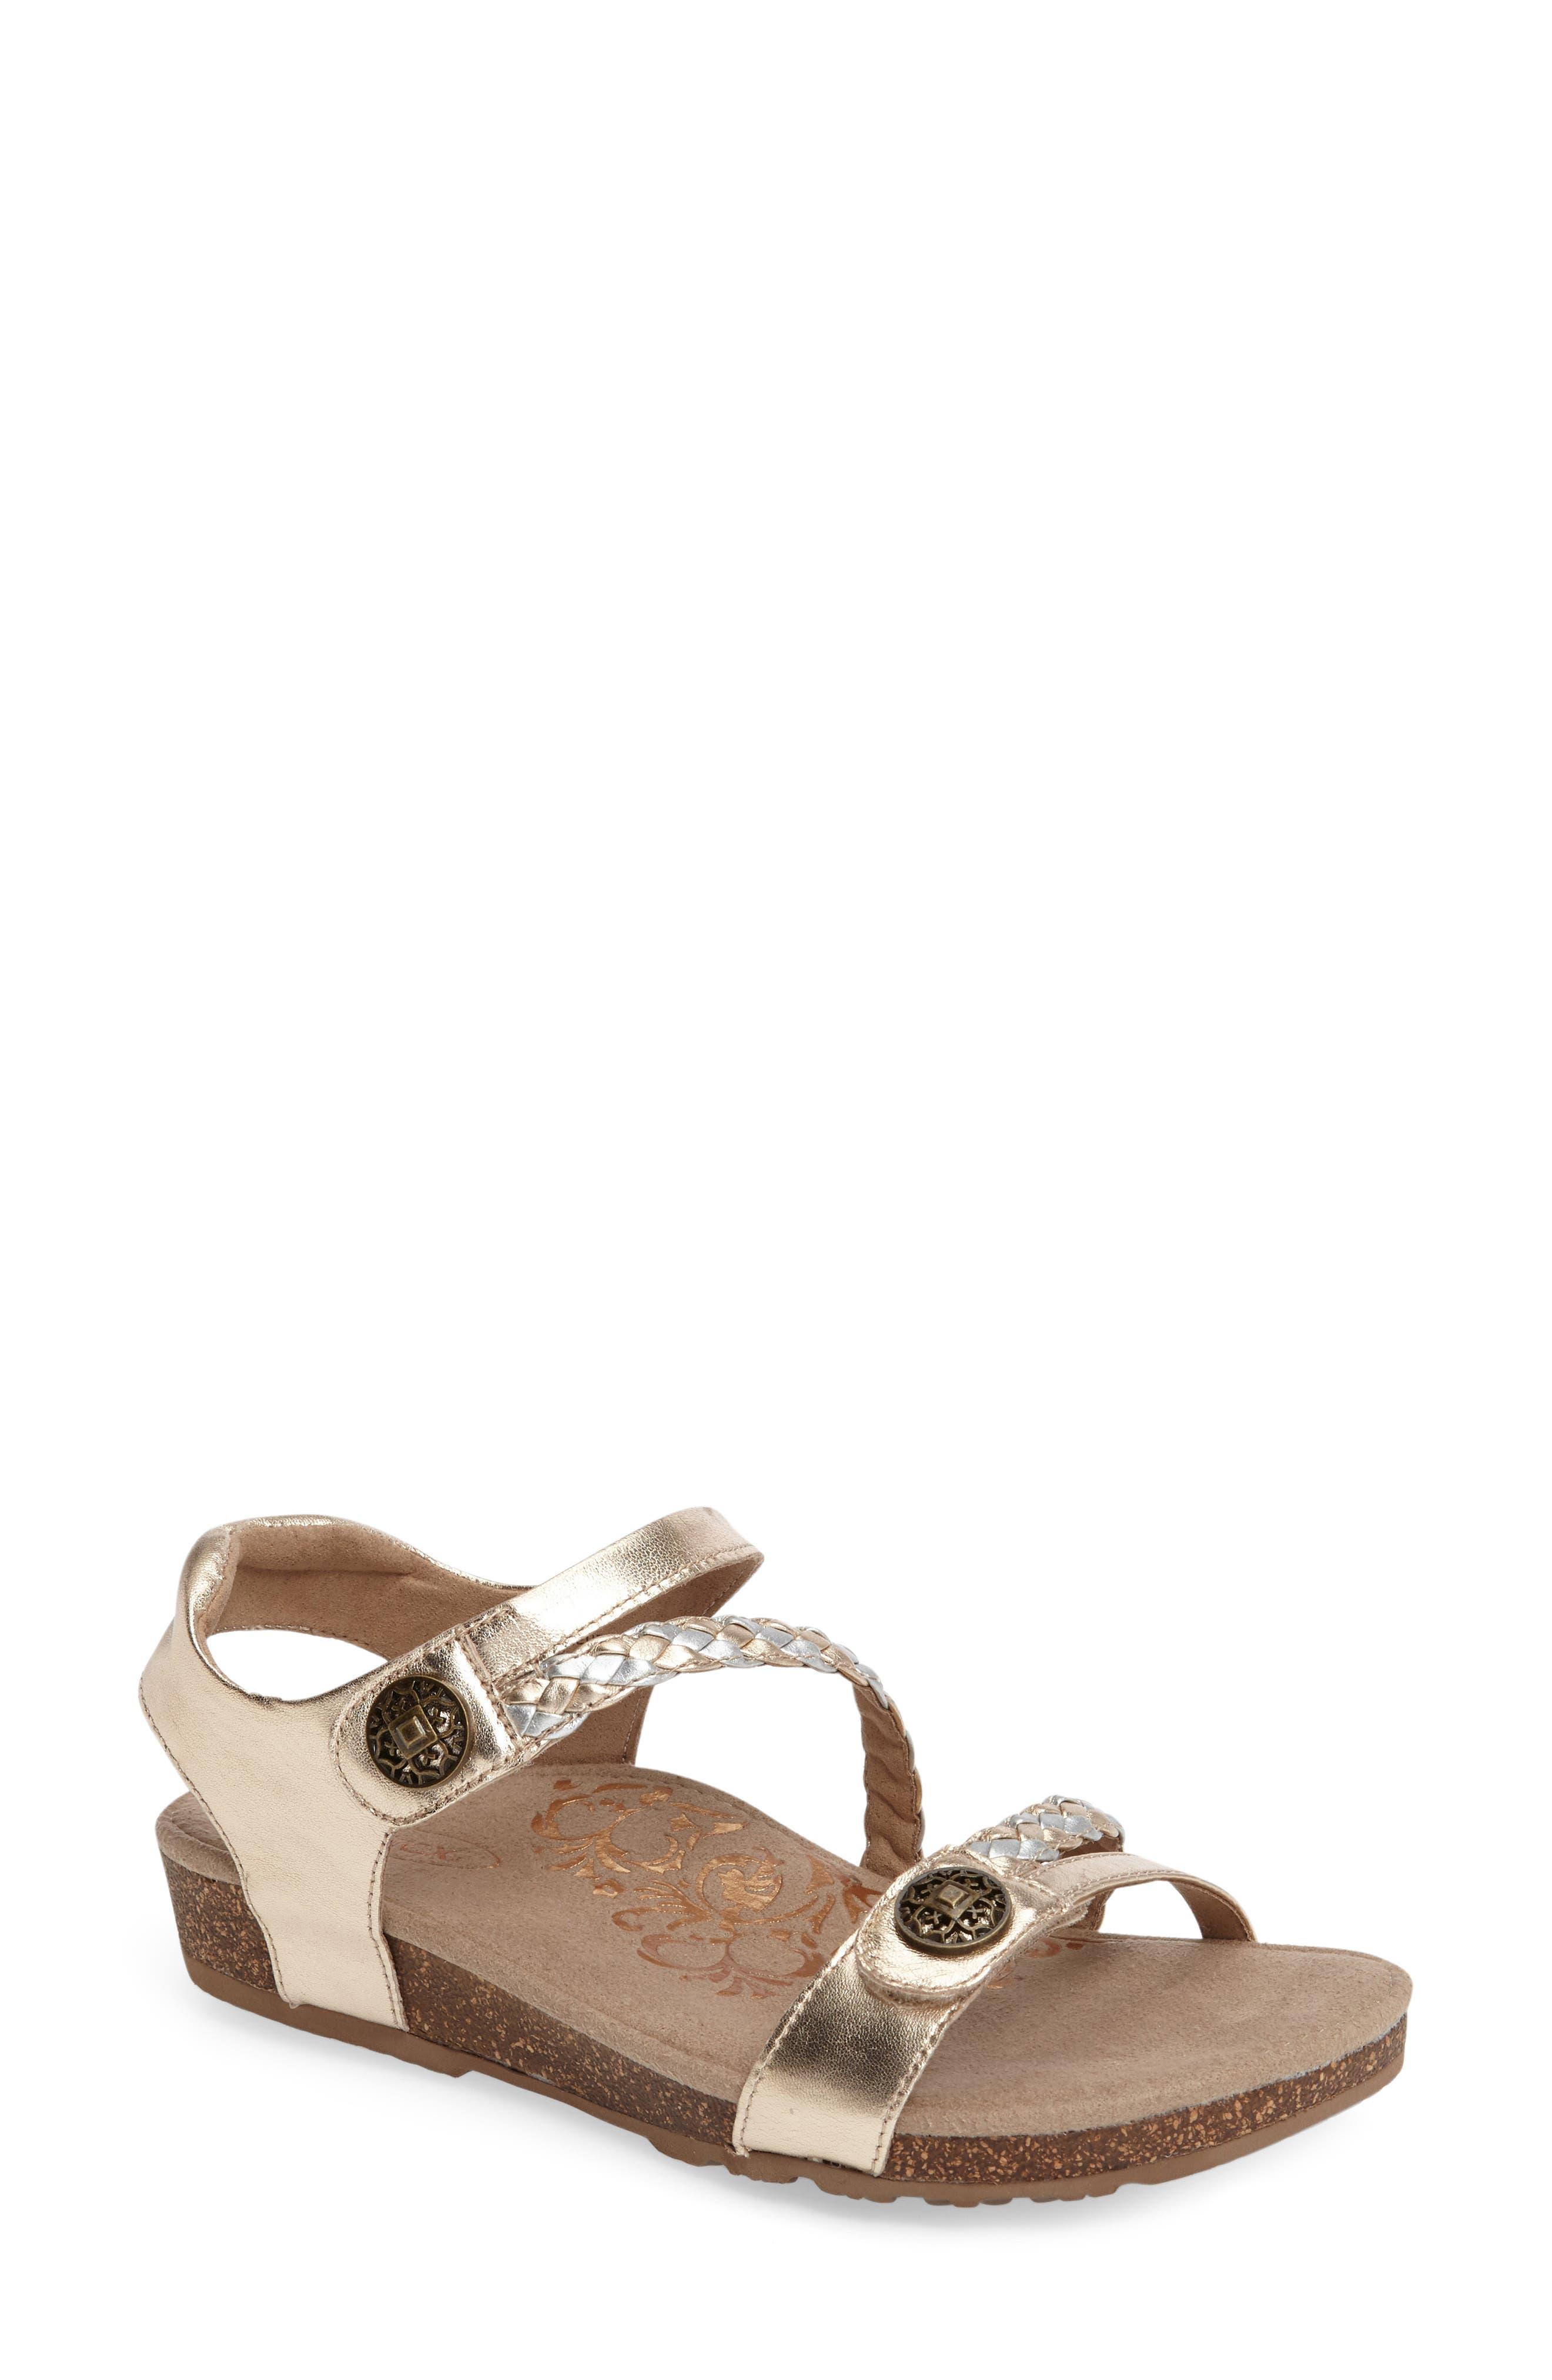 Alternate Image 1 Selected - Aetrex 'Jillian' Braided Leather Strap Sandal (Women)